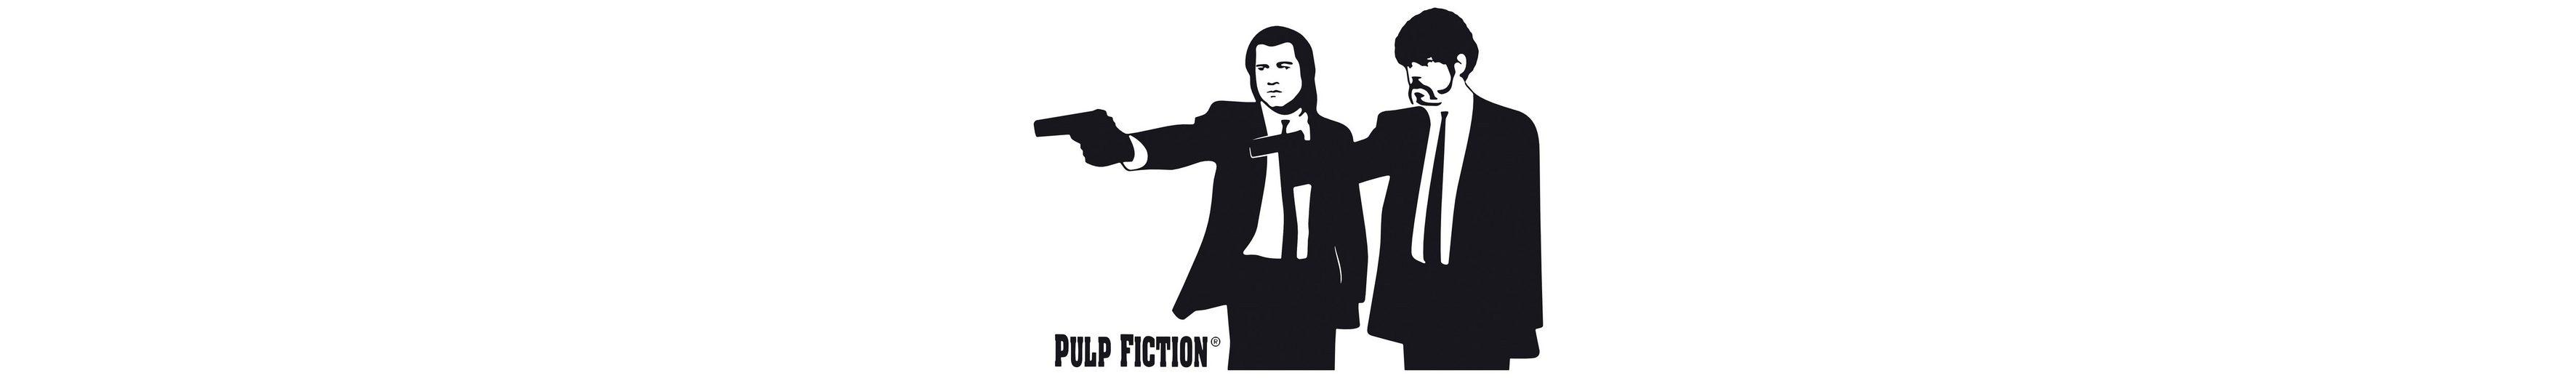 Home affaire Wandtattoo » Pulp Fiction - Silhouette Jules & Vince«, 100/71 cm